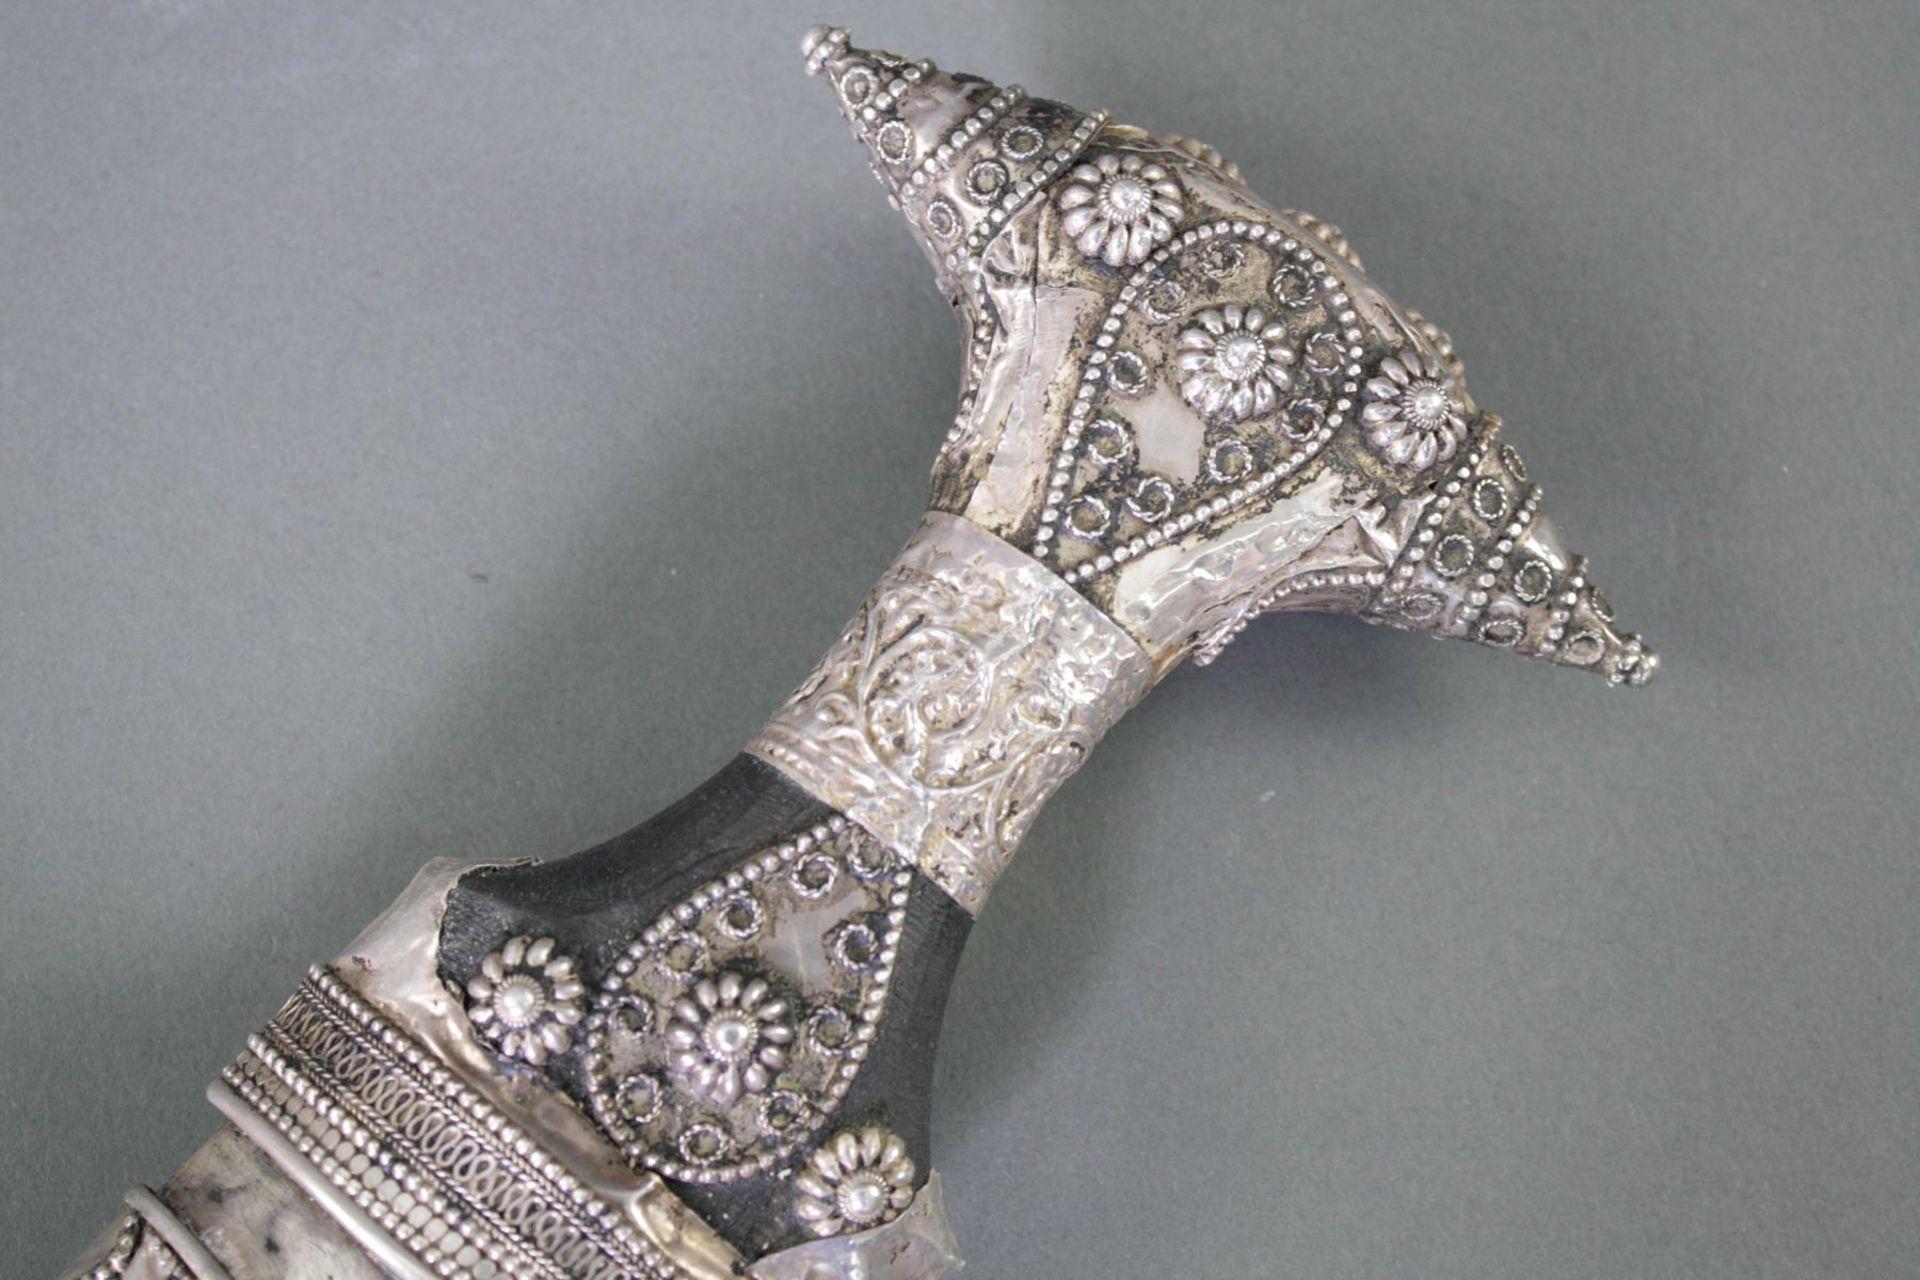 Jambiya Krummdolch, Saudi Arabien, 20. Jahrhundert - Bild 2 aus 6